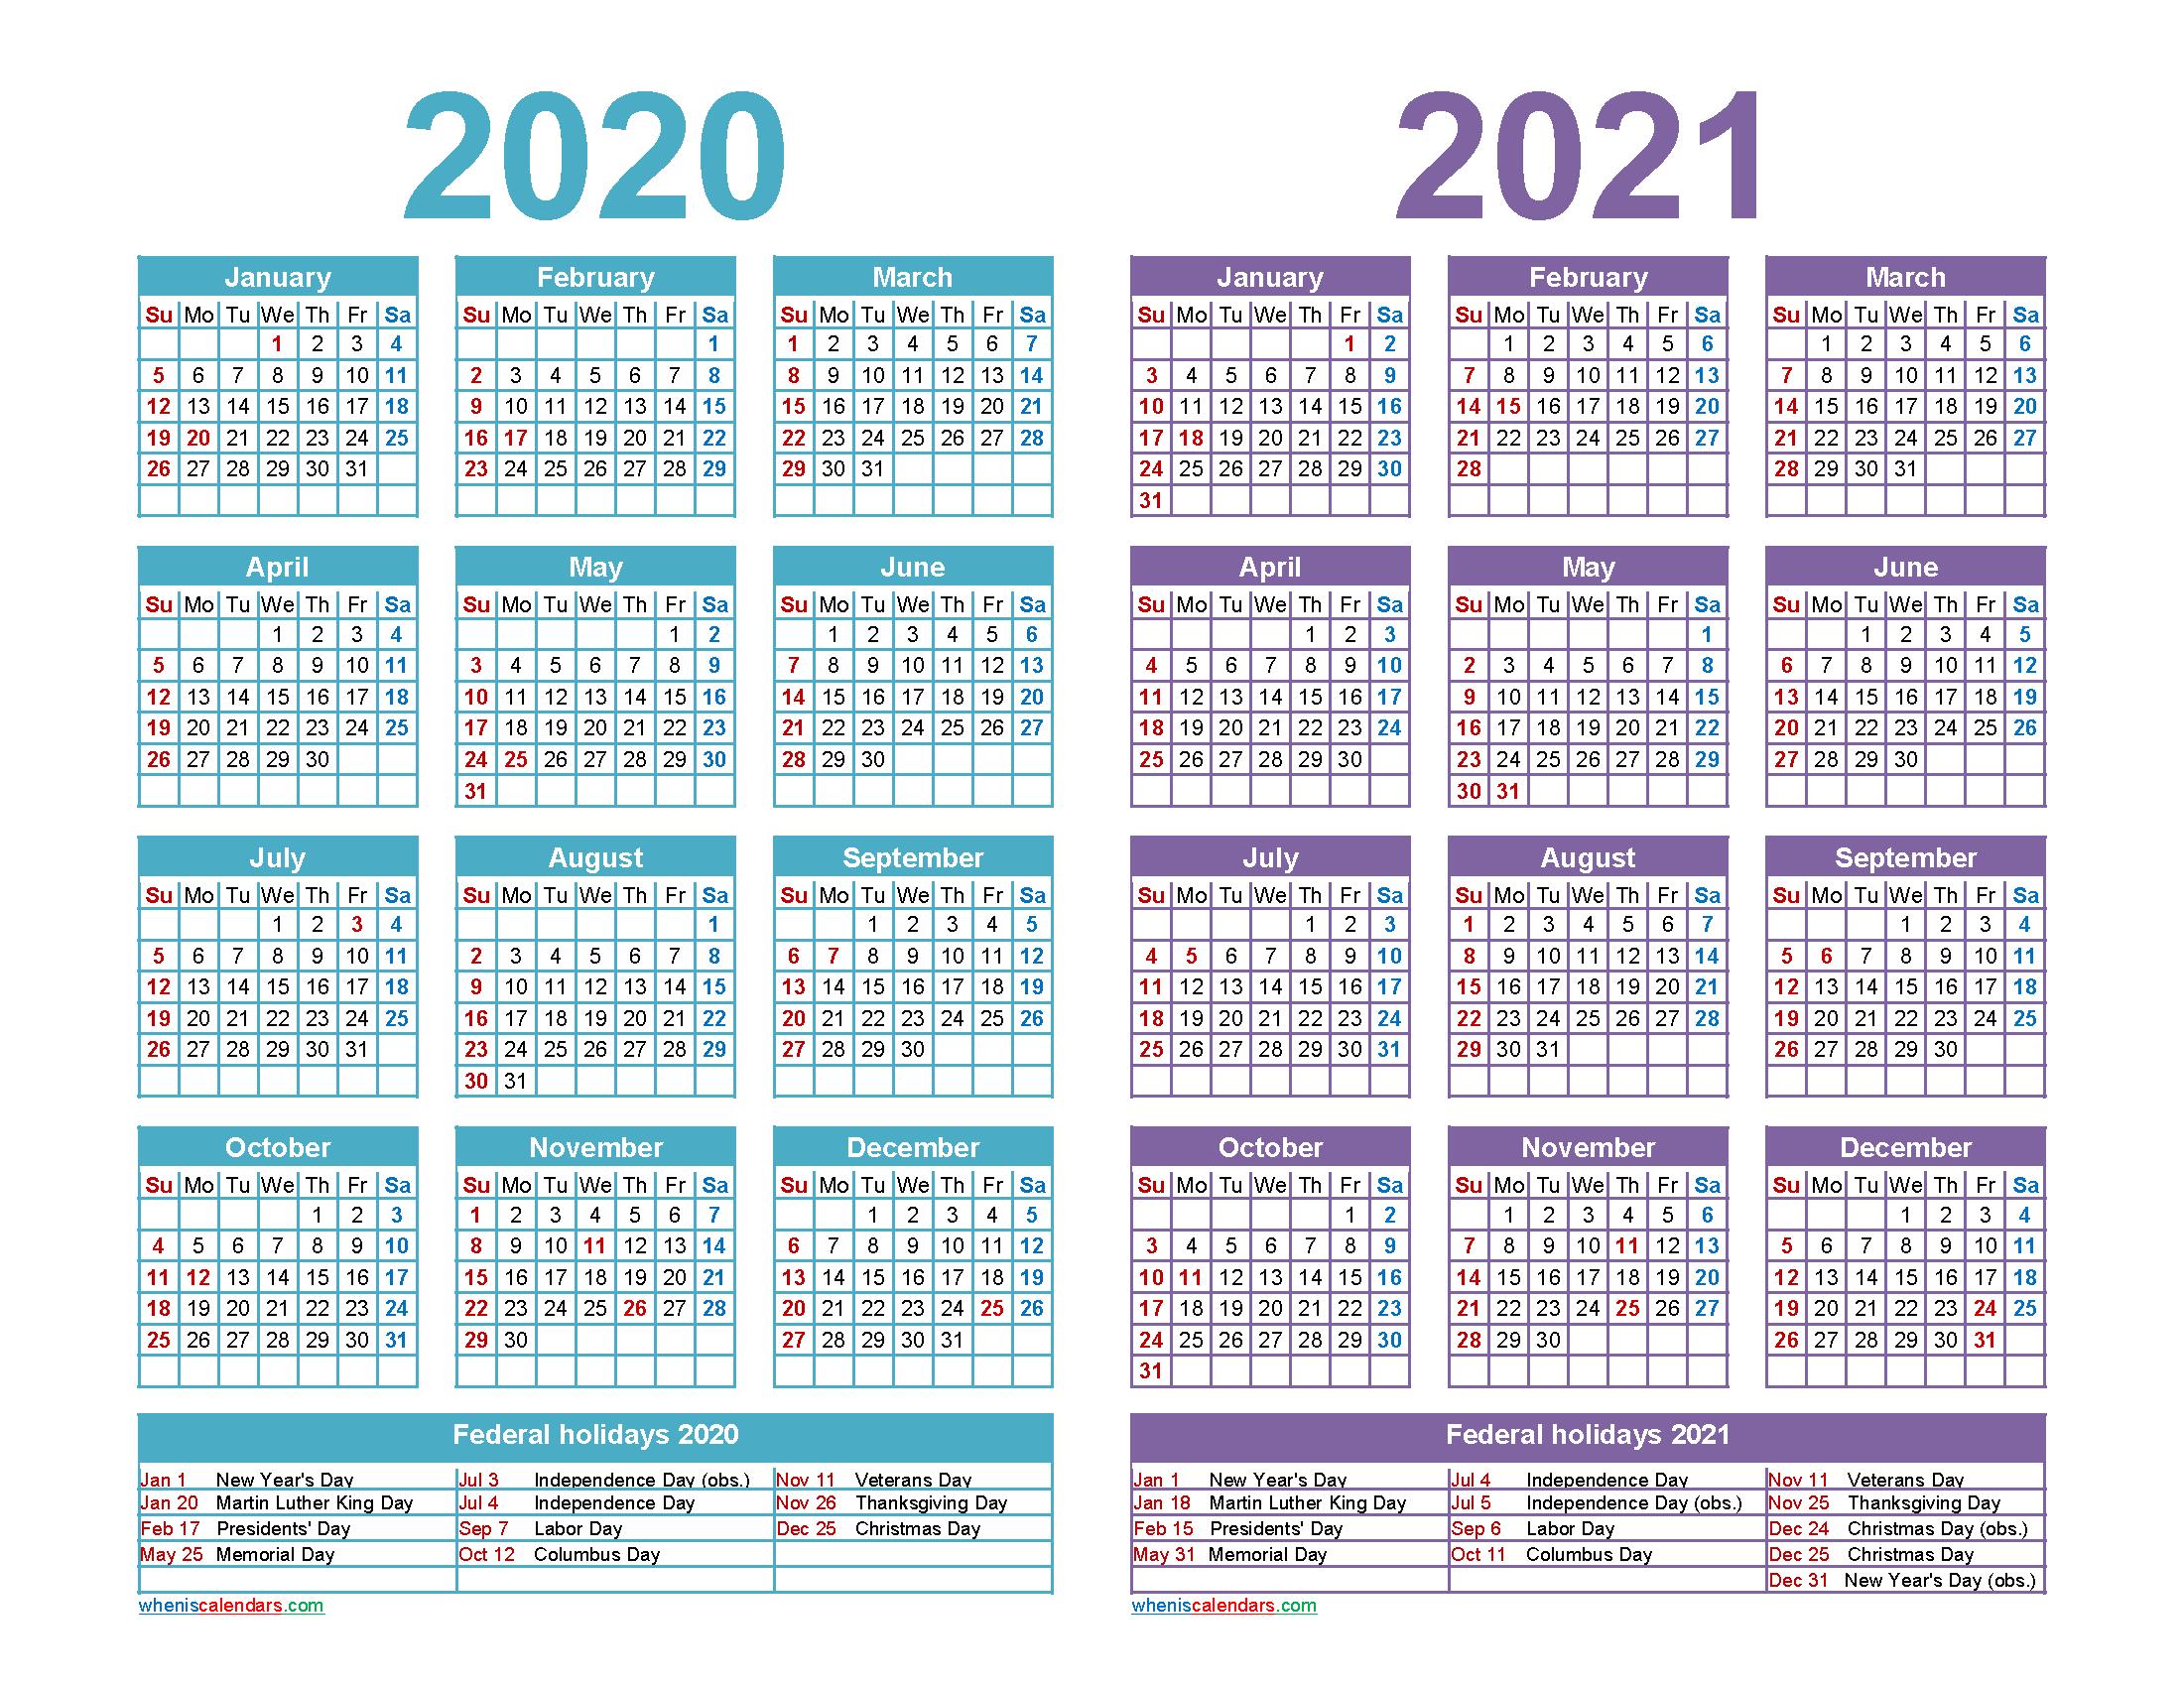 Free 2020 2021 Calendar Printable Word, PDF | Free ...